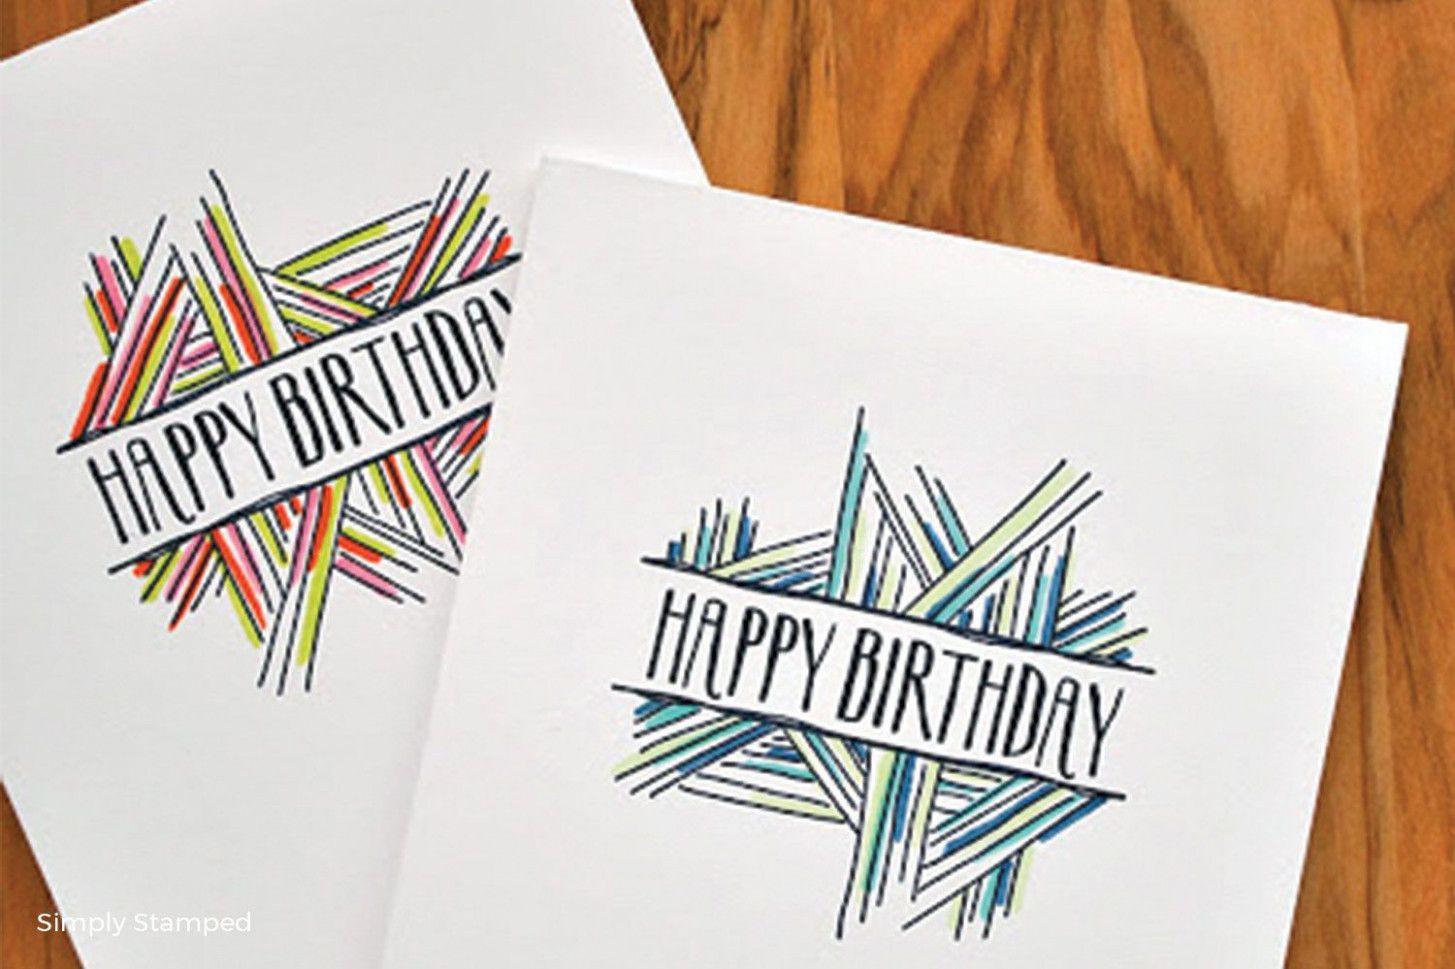 Easy Diy Card Designs In Trends 2020 2021 Homemade Birthday Cards Husband Birthday Card Homemade Birthday